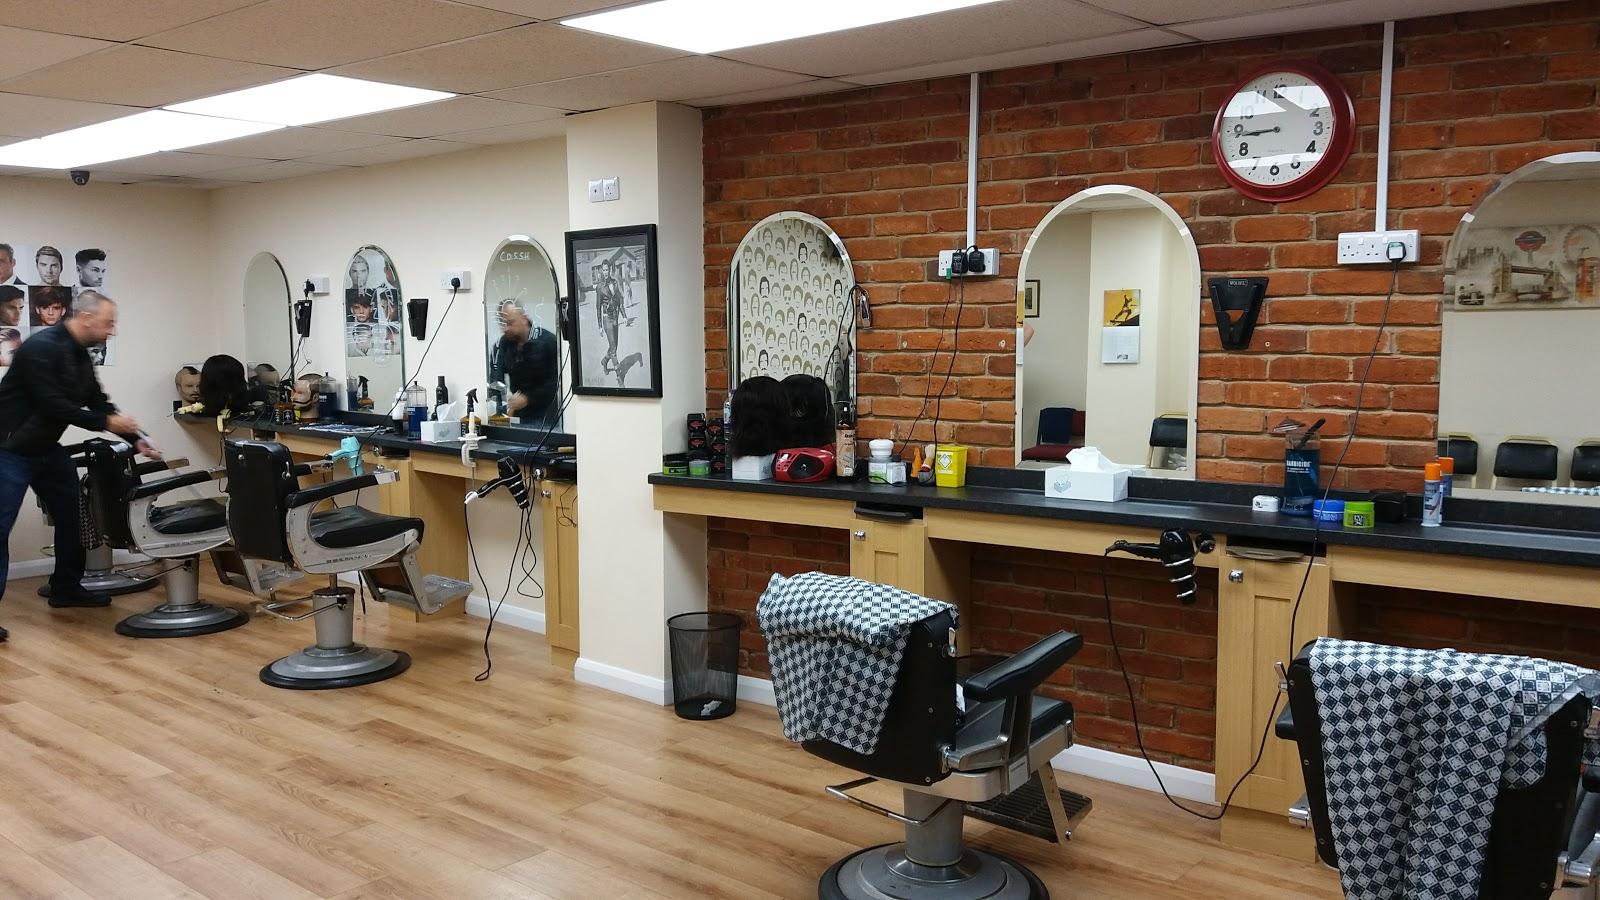 London Street Barber Shop